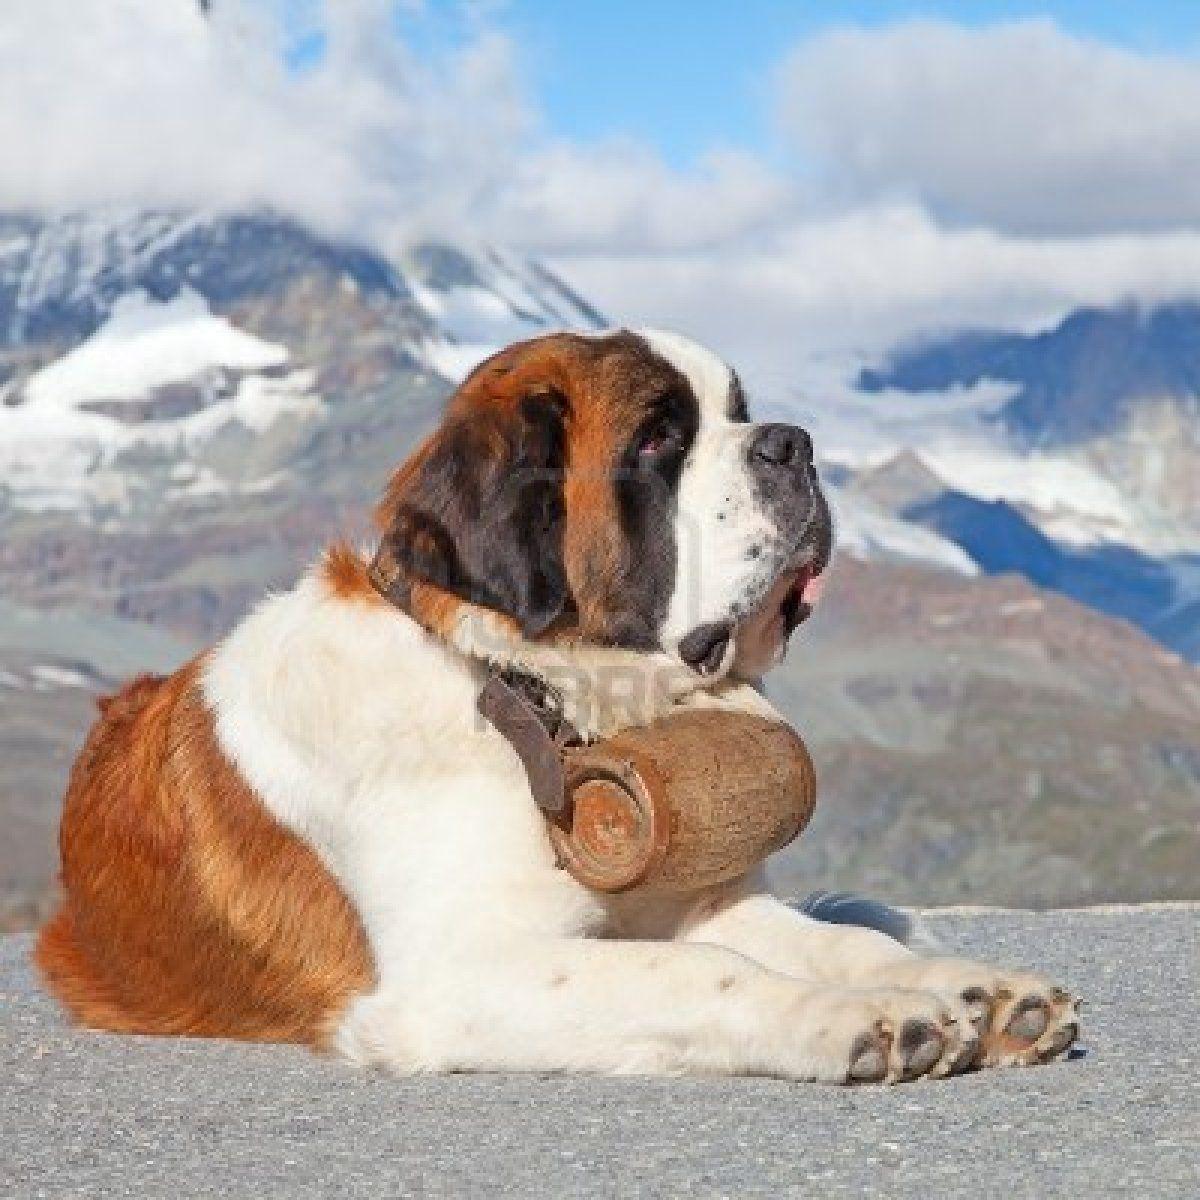 Dog Rescue Avalanche Italy